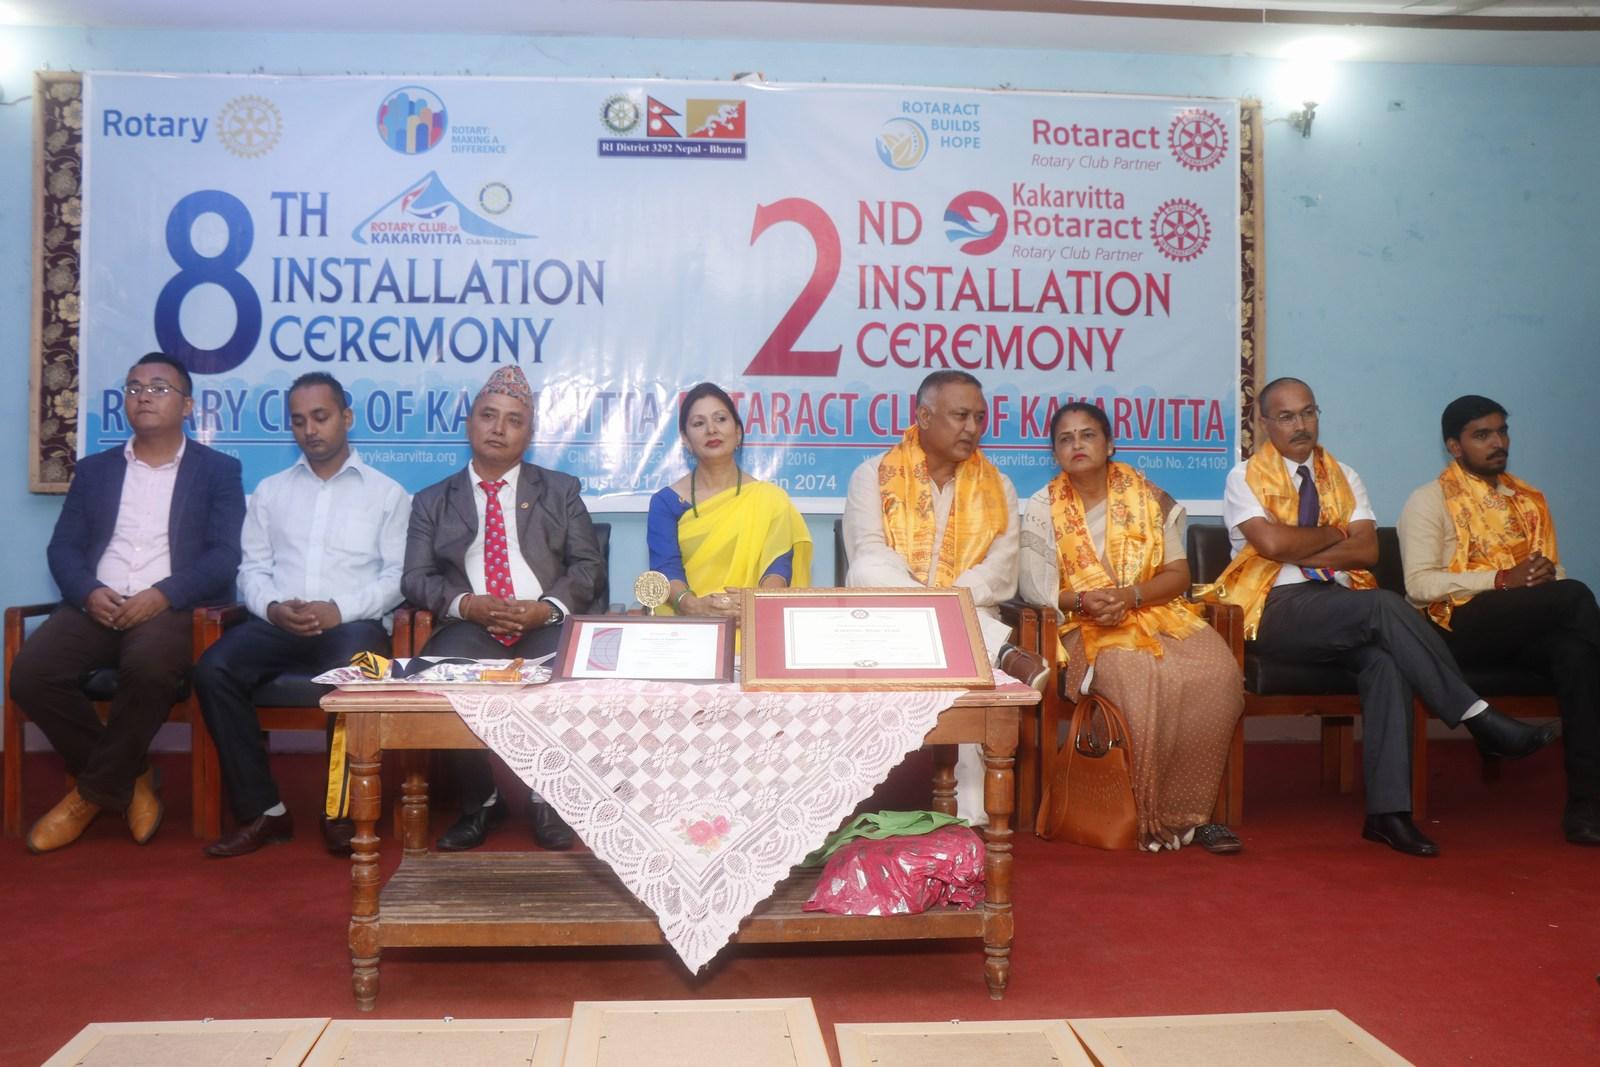 8th-Installation-Ceremony-Rotary-Club-of-Kakarvitta-21